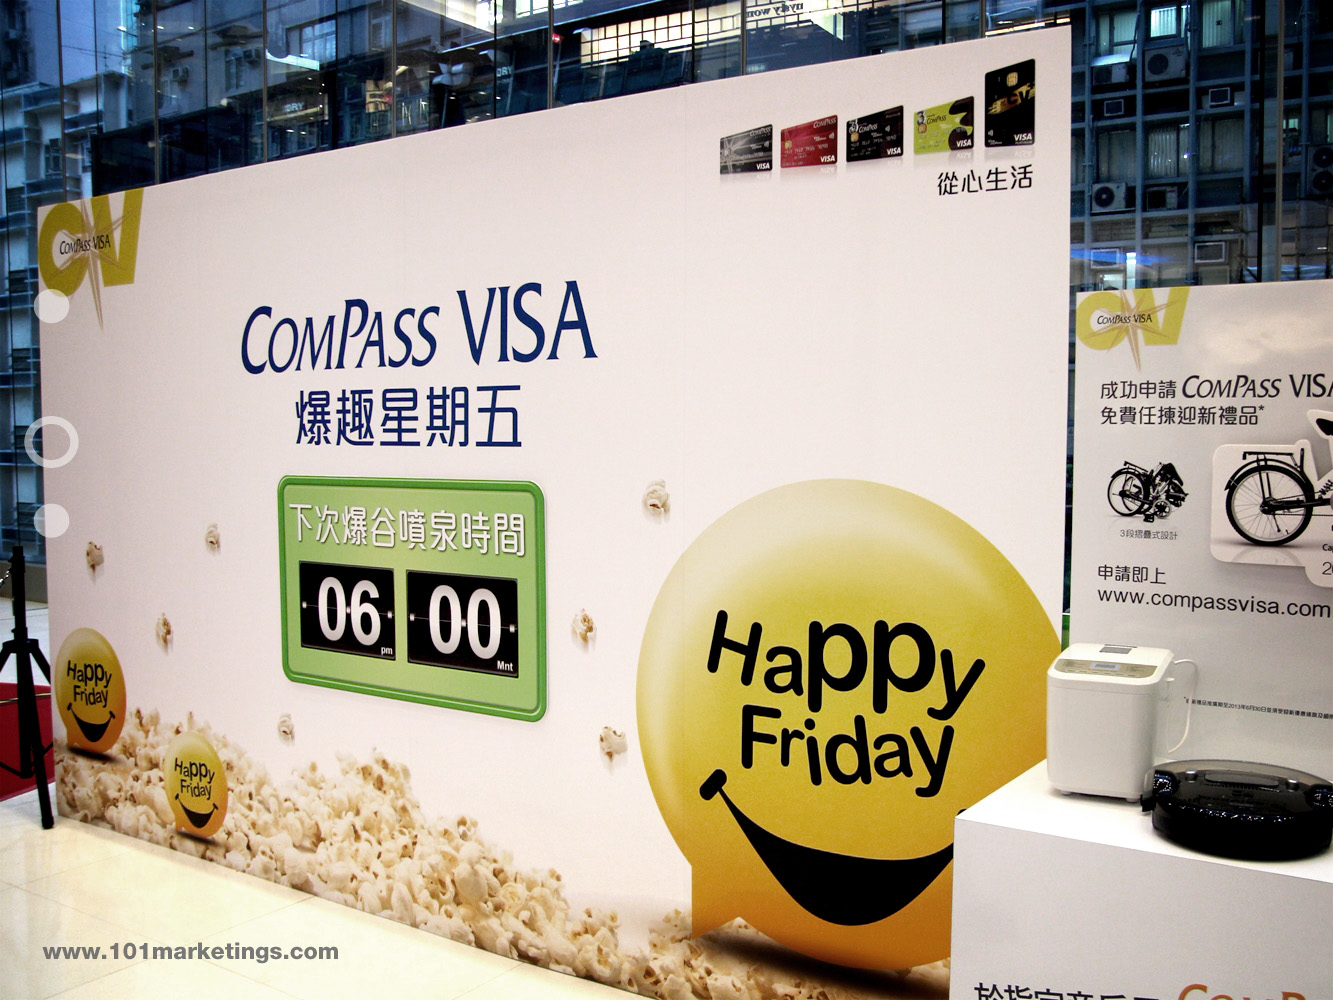 Compass Visa